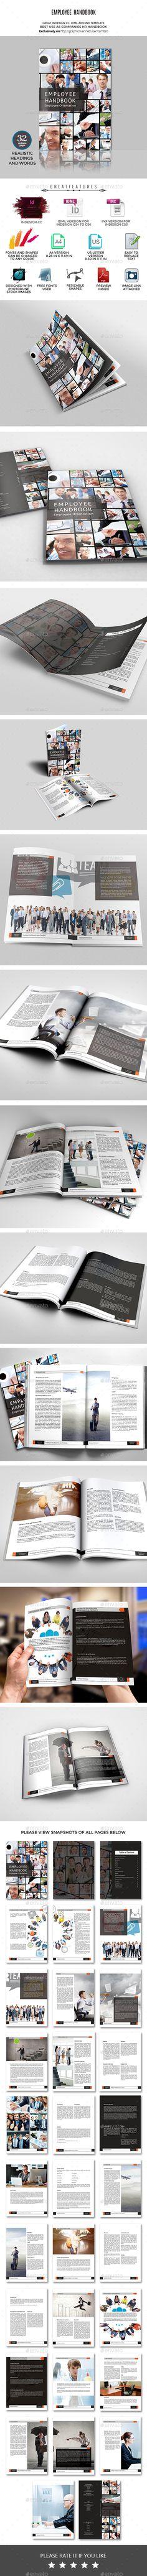 the 9 best employee handbook inspiration images on pinterest